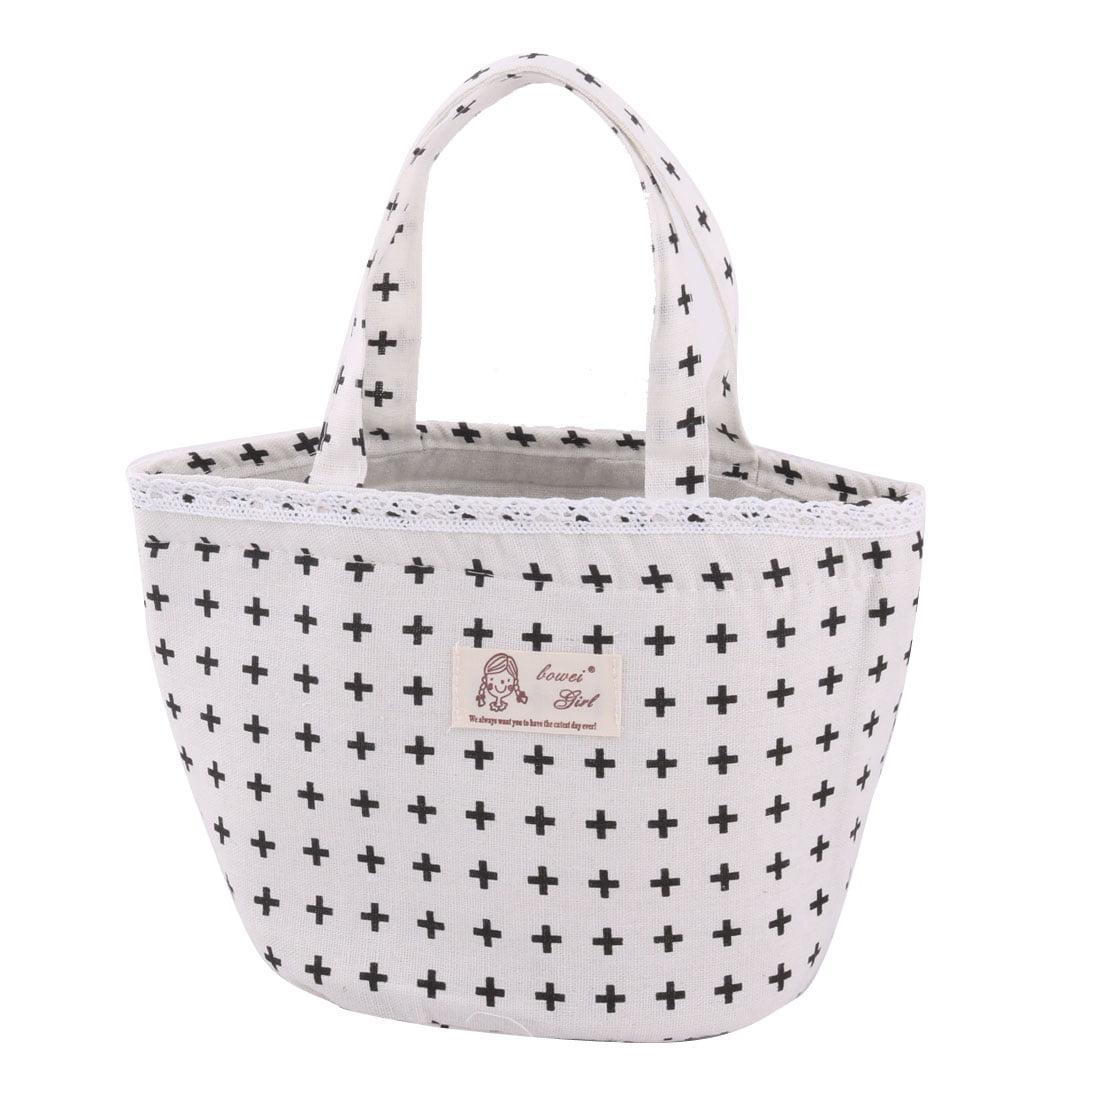 School Cotton Linen Symbol Print Lunch Box Holder Cooler Bag Drawstring Handbag